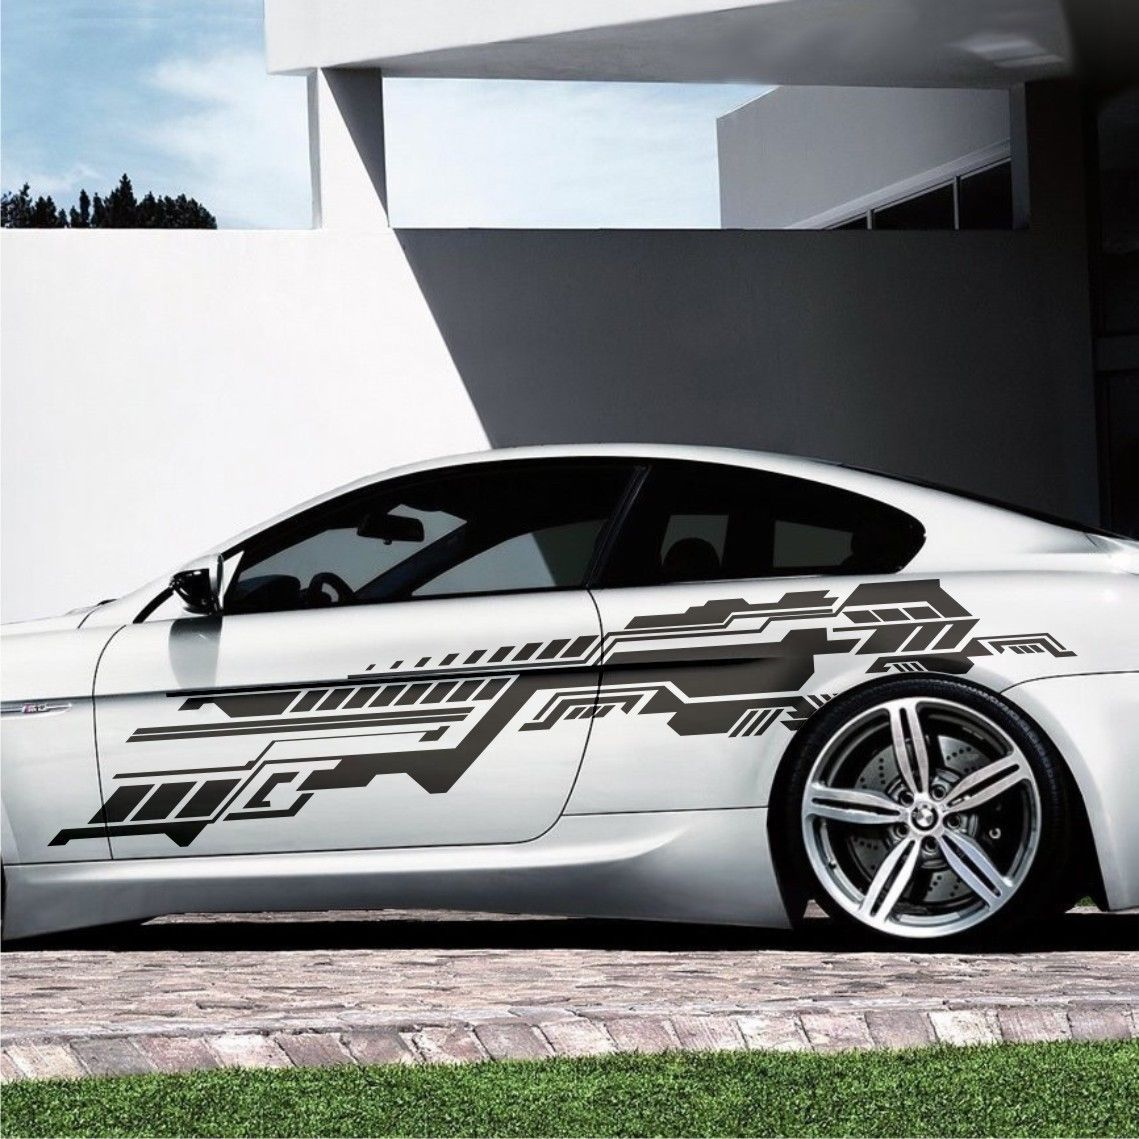 2x Future Design Grafik Seitenaufkleber 230cm Auto Aufkleber